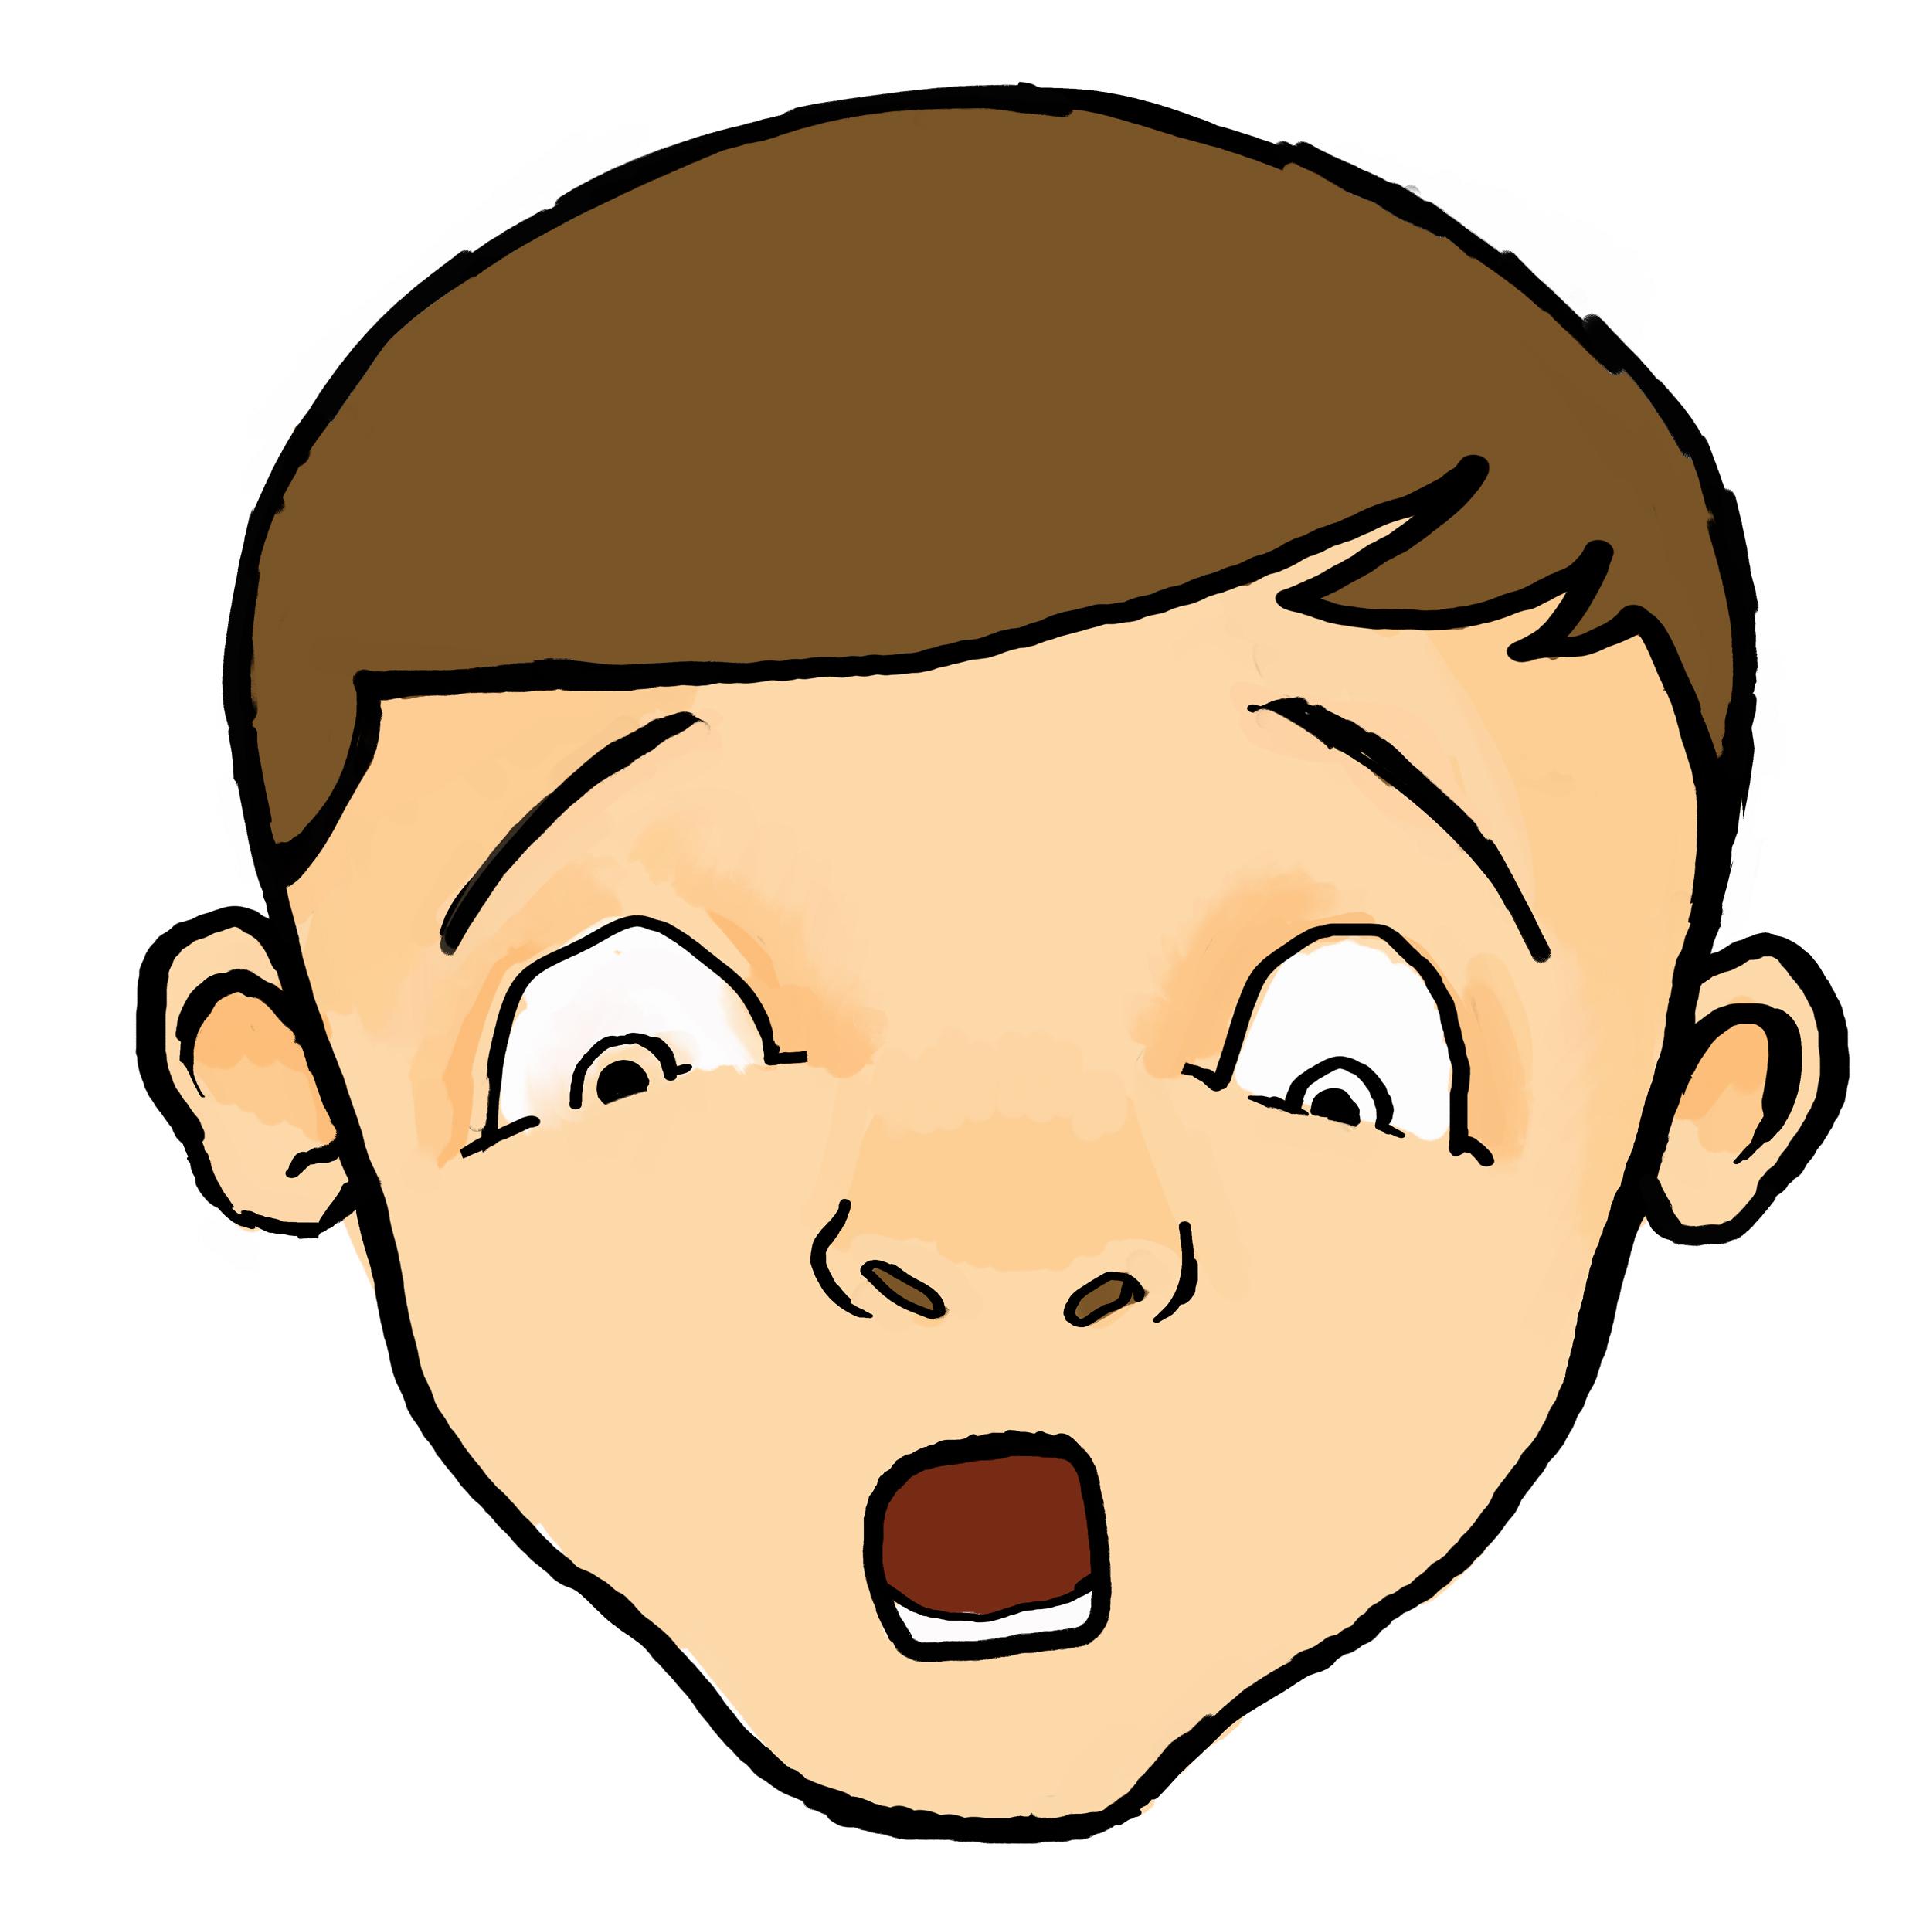 Clip Art Cartoon Faces Cliparts Co